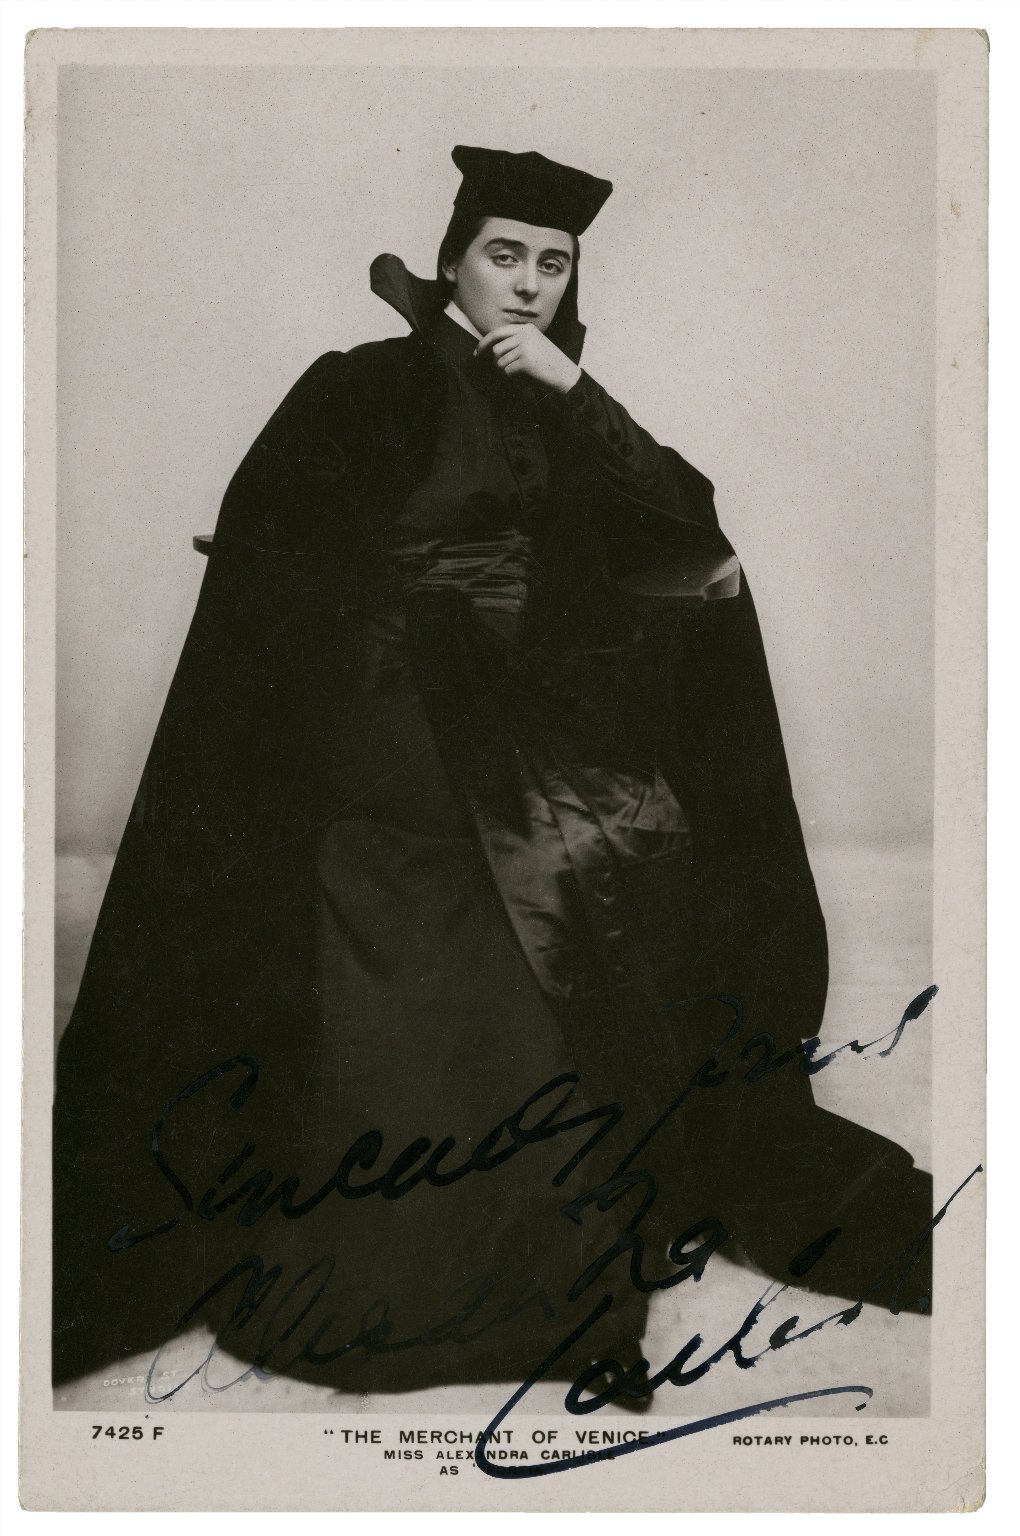 The merchant of Venice, Miss Alexandra Carlisle [as Portia] [graphic].